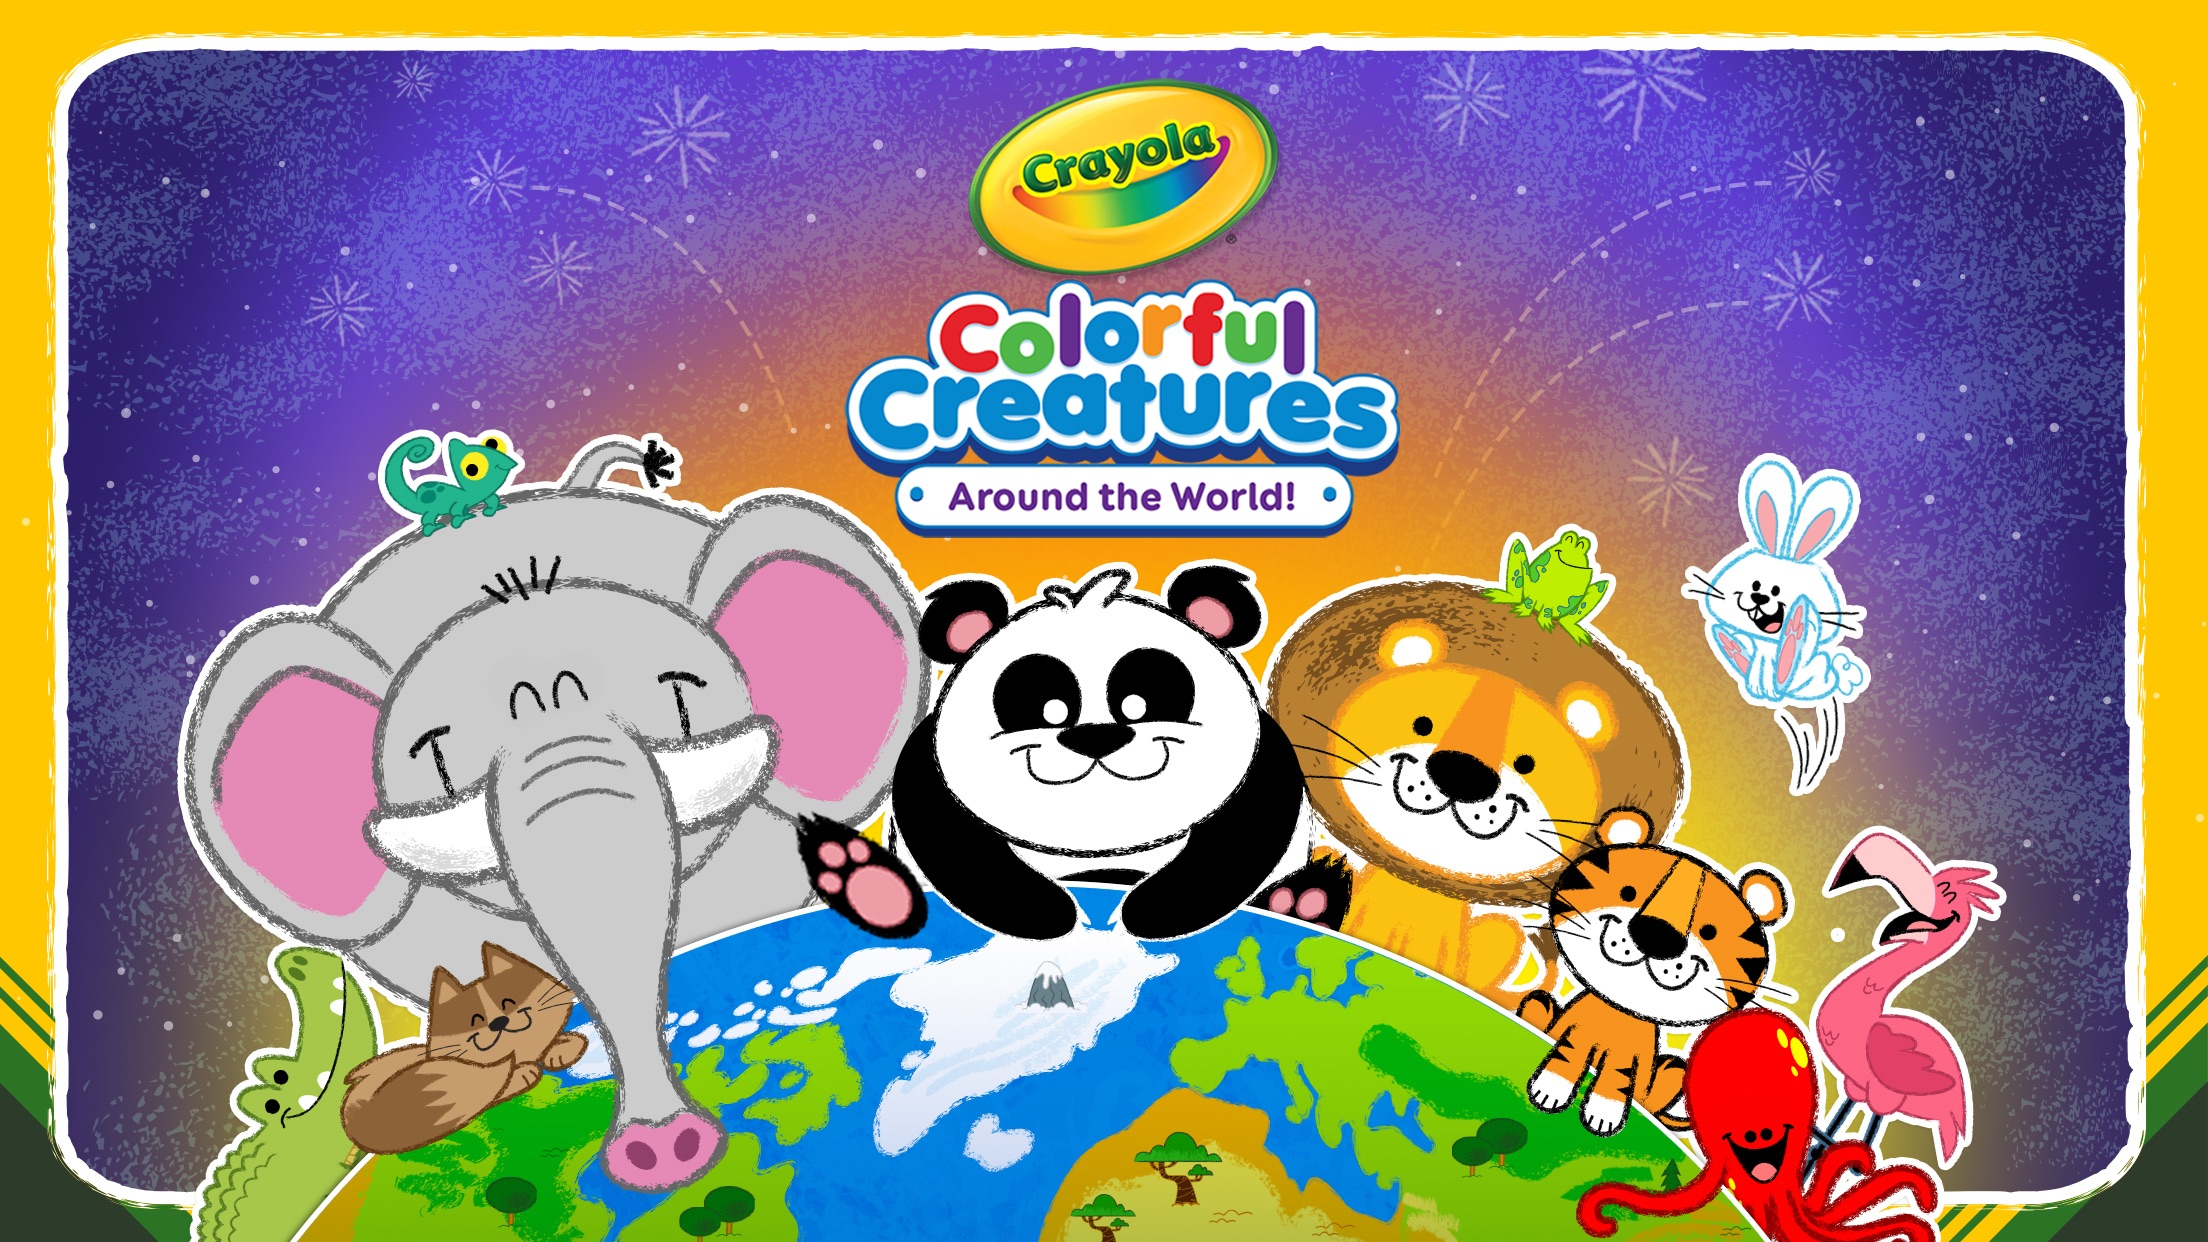 Crayola Colorful Creatures - Around the World! Screenshot